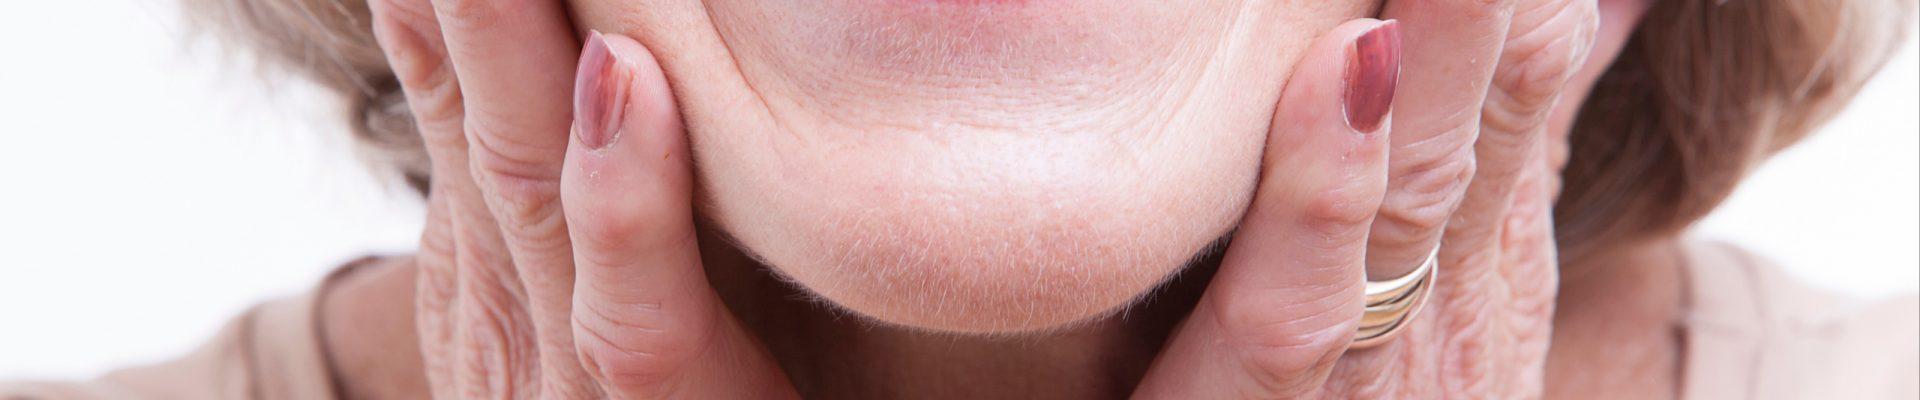 Cuidado dental personas mayores Clínica Dental Achútegui